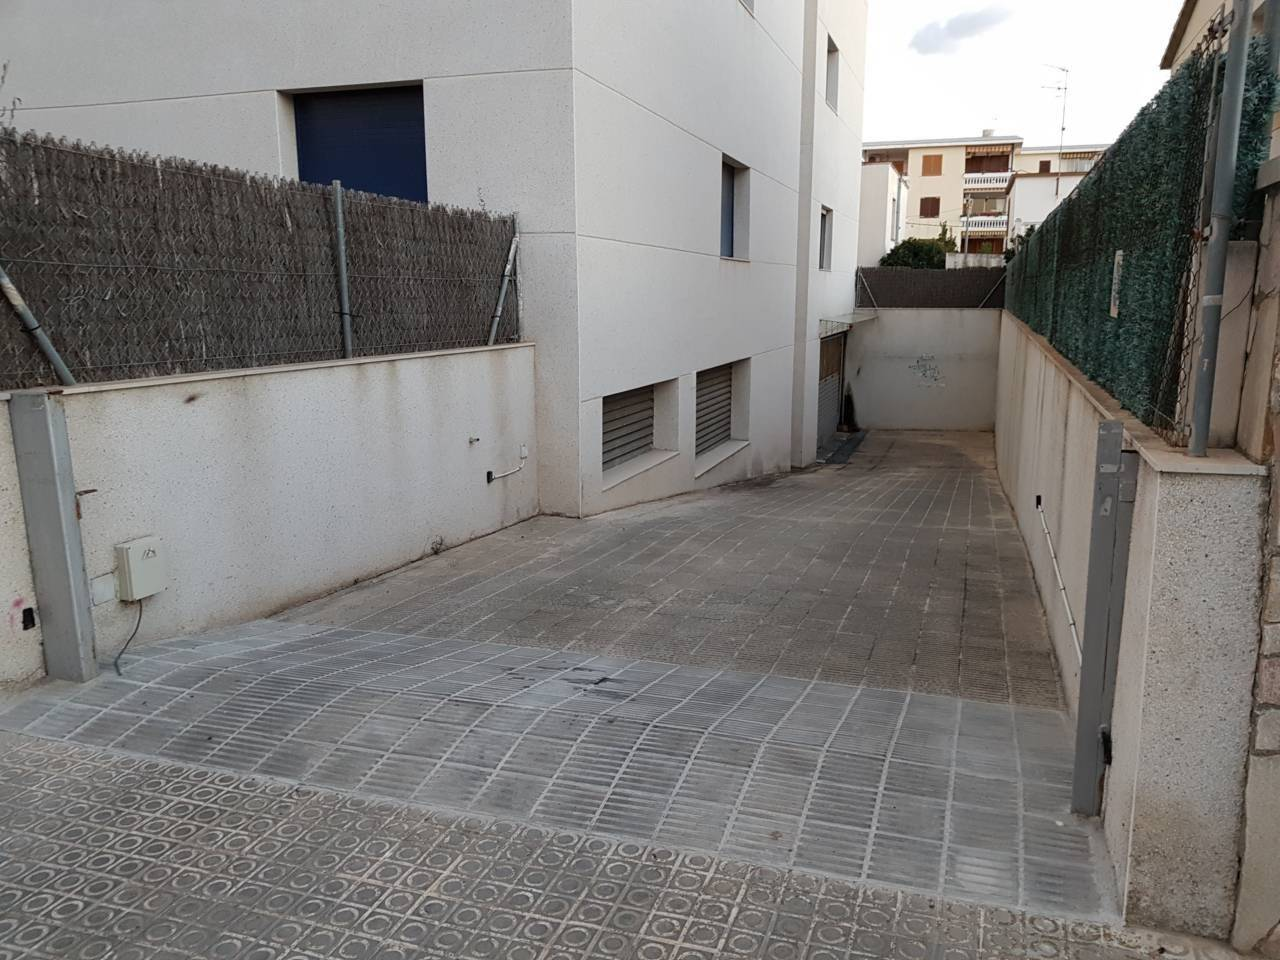 Parking / Barcelona / Vilanova i la Geltrú / La Collada-Els Sis Camins-Fondo Somella-Santa Mari